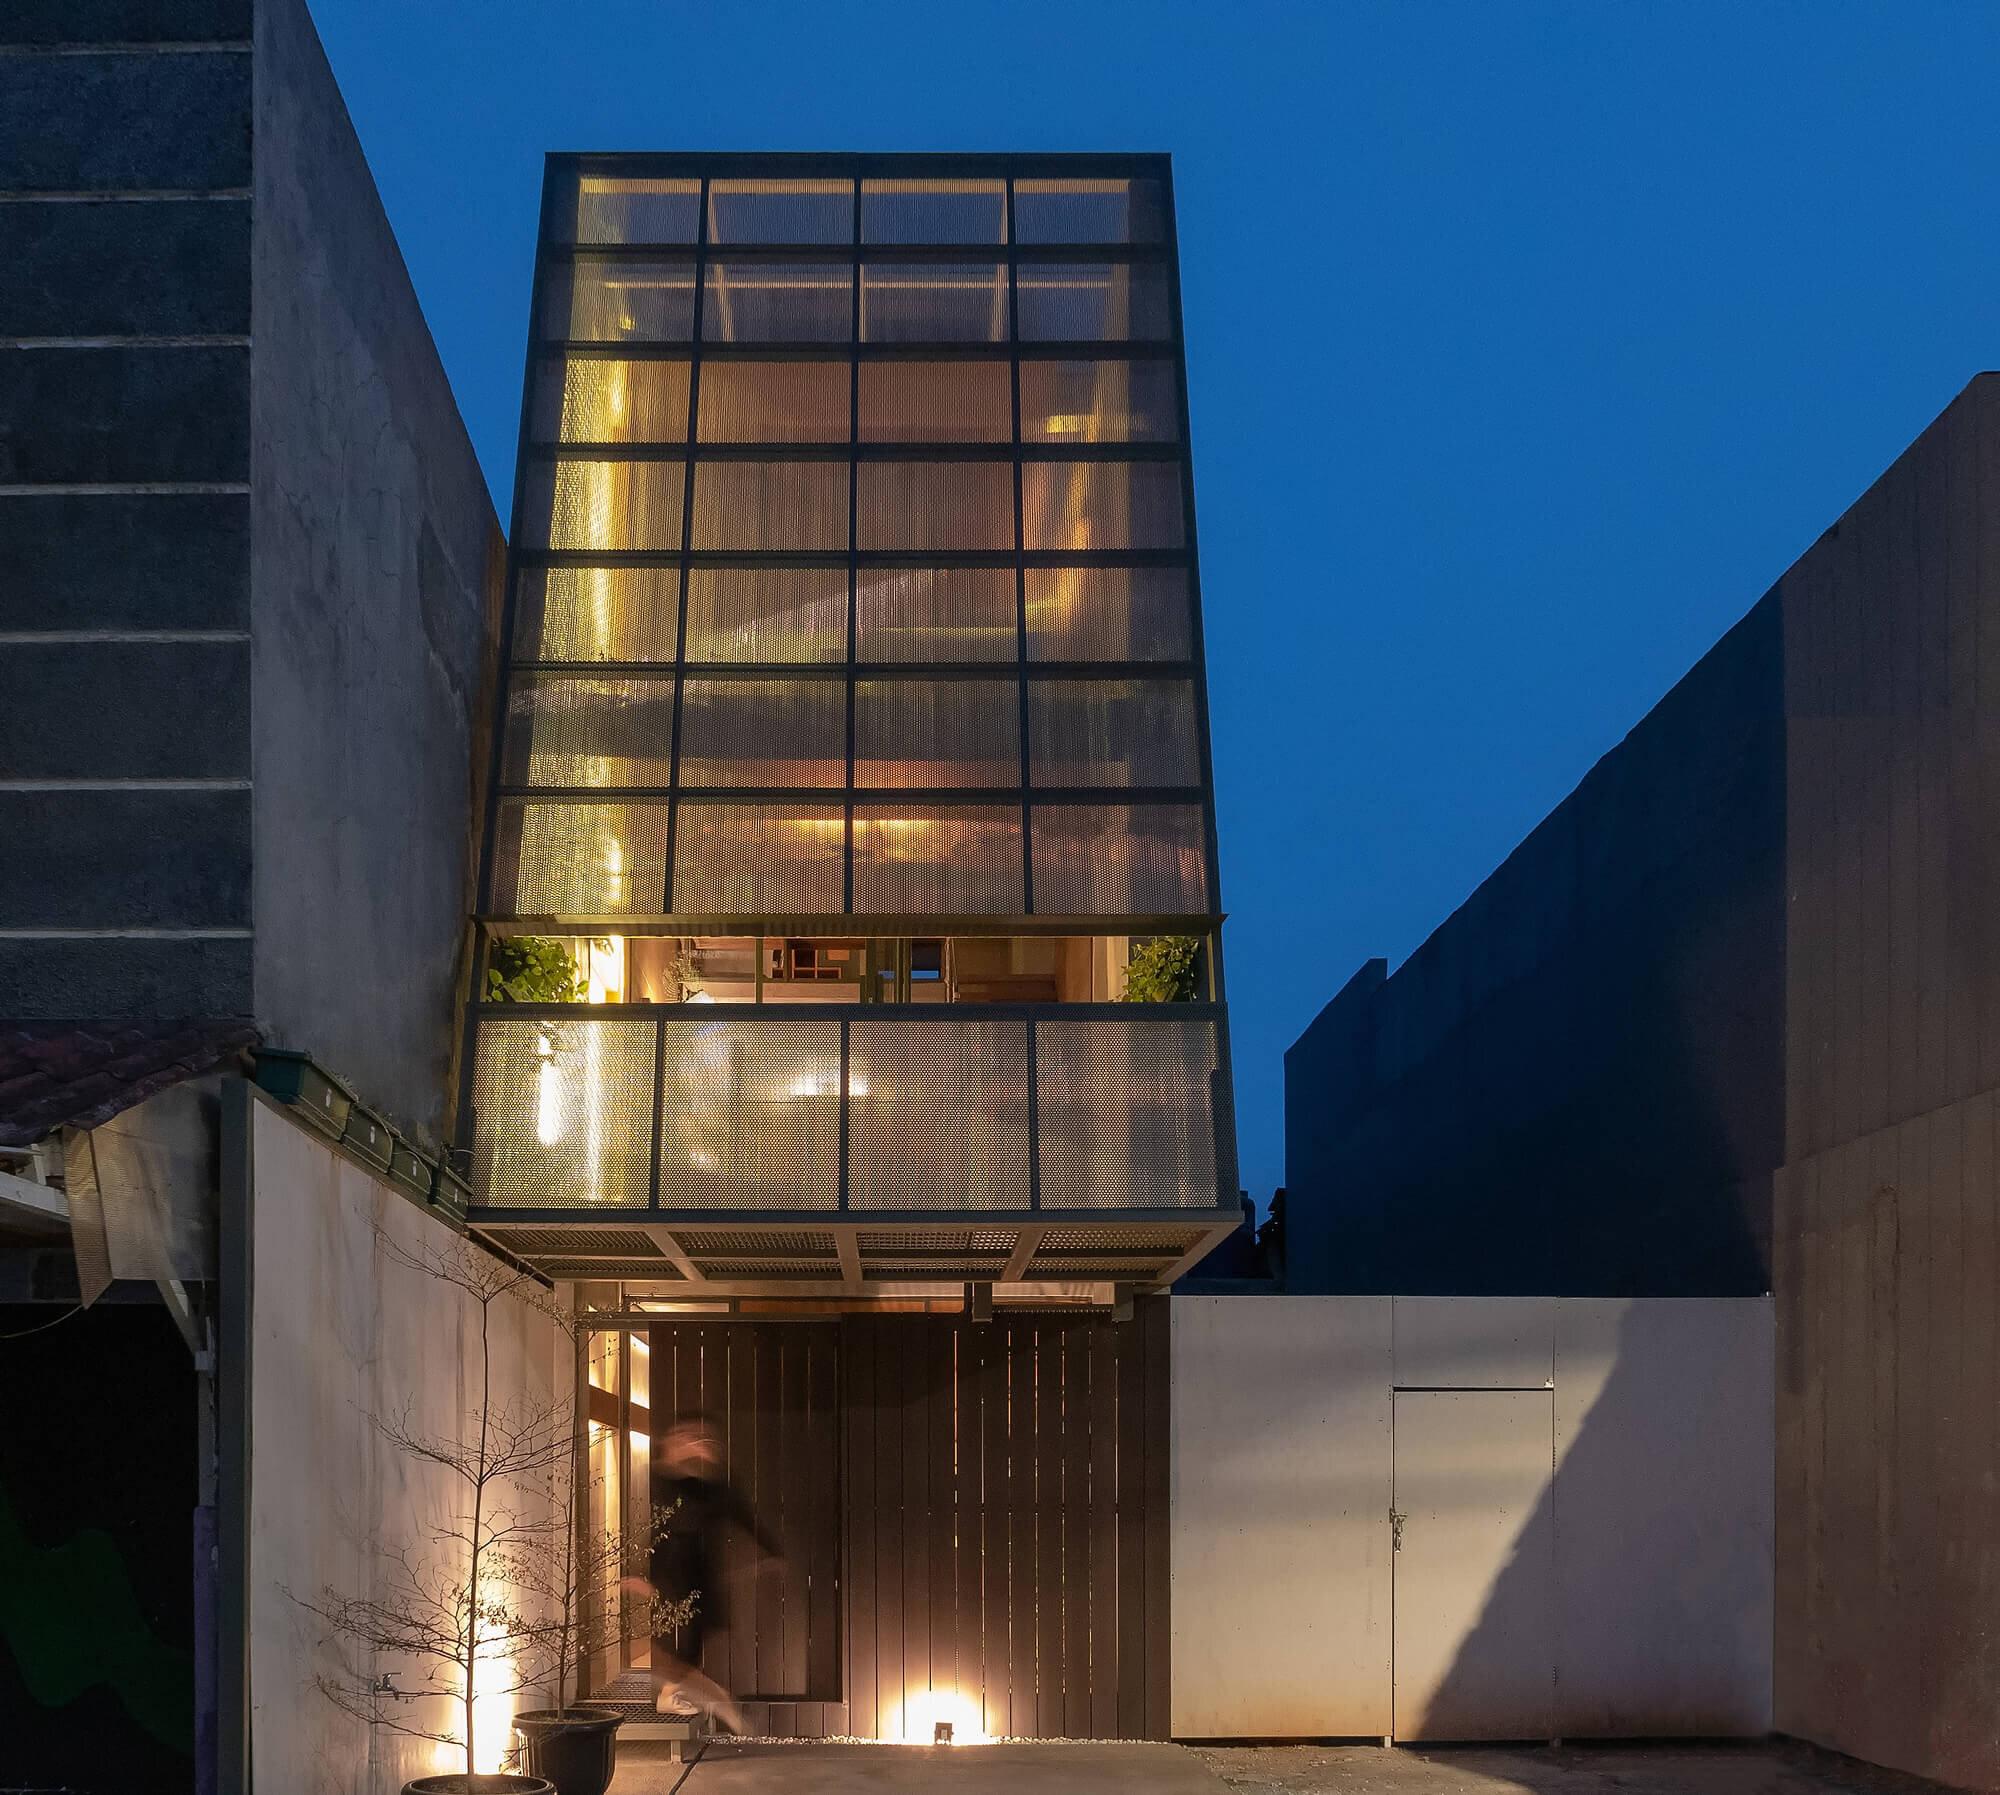 3500-Millimetre-House-Ago-Architects-Indonesia-0